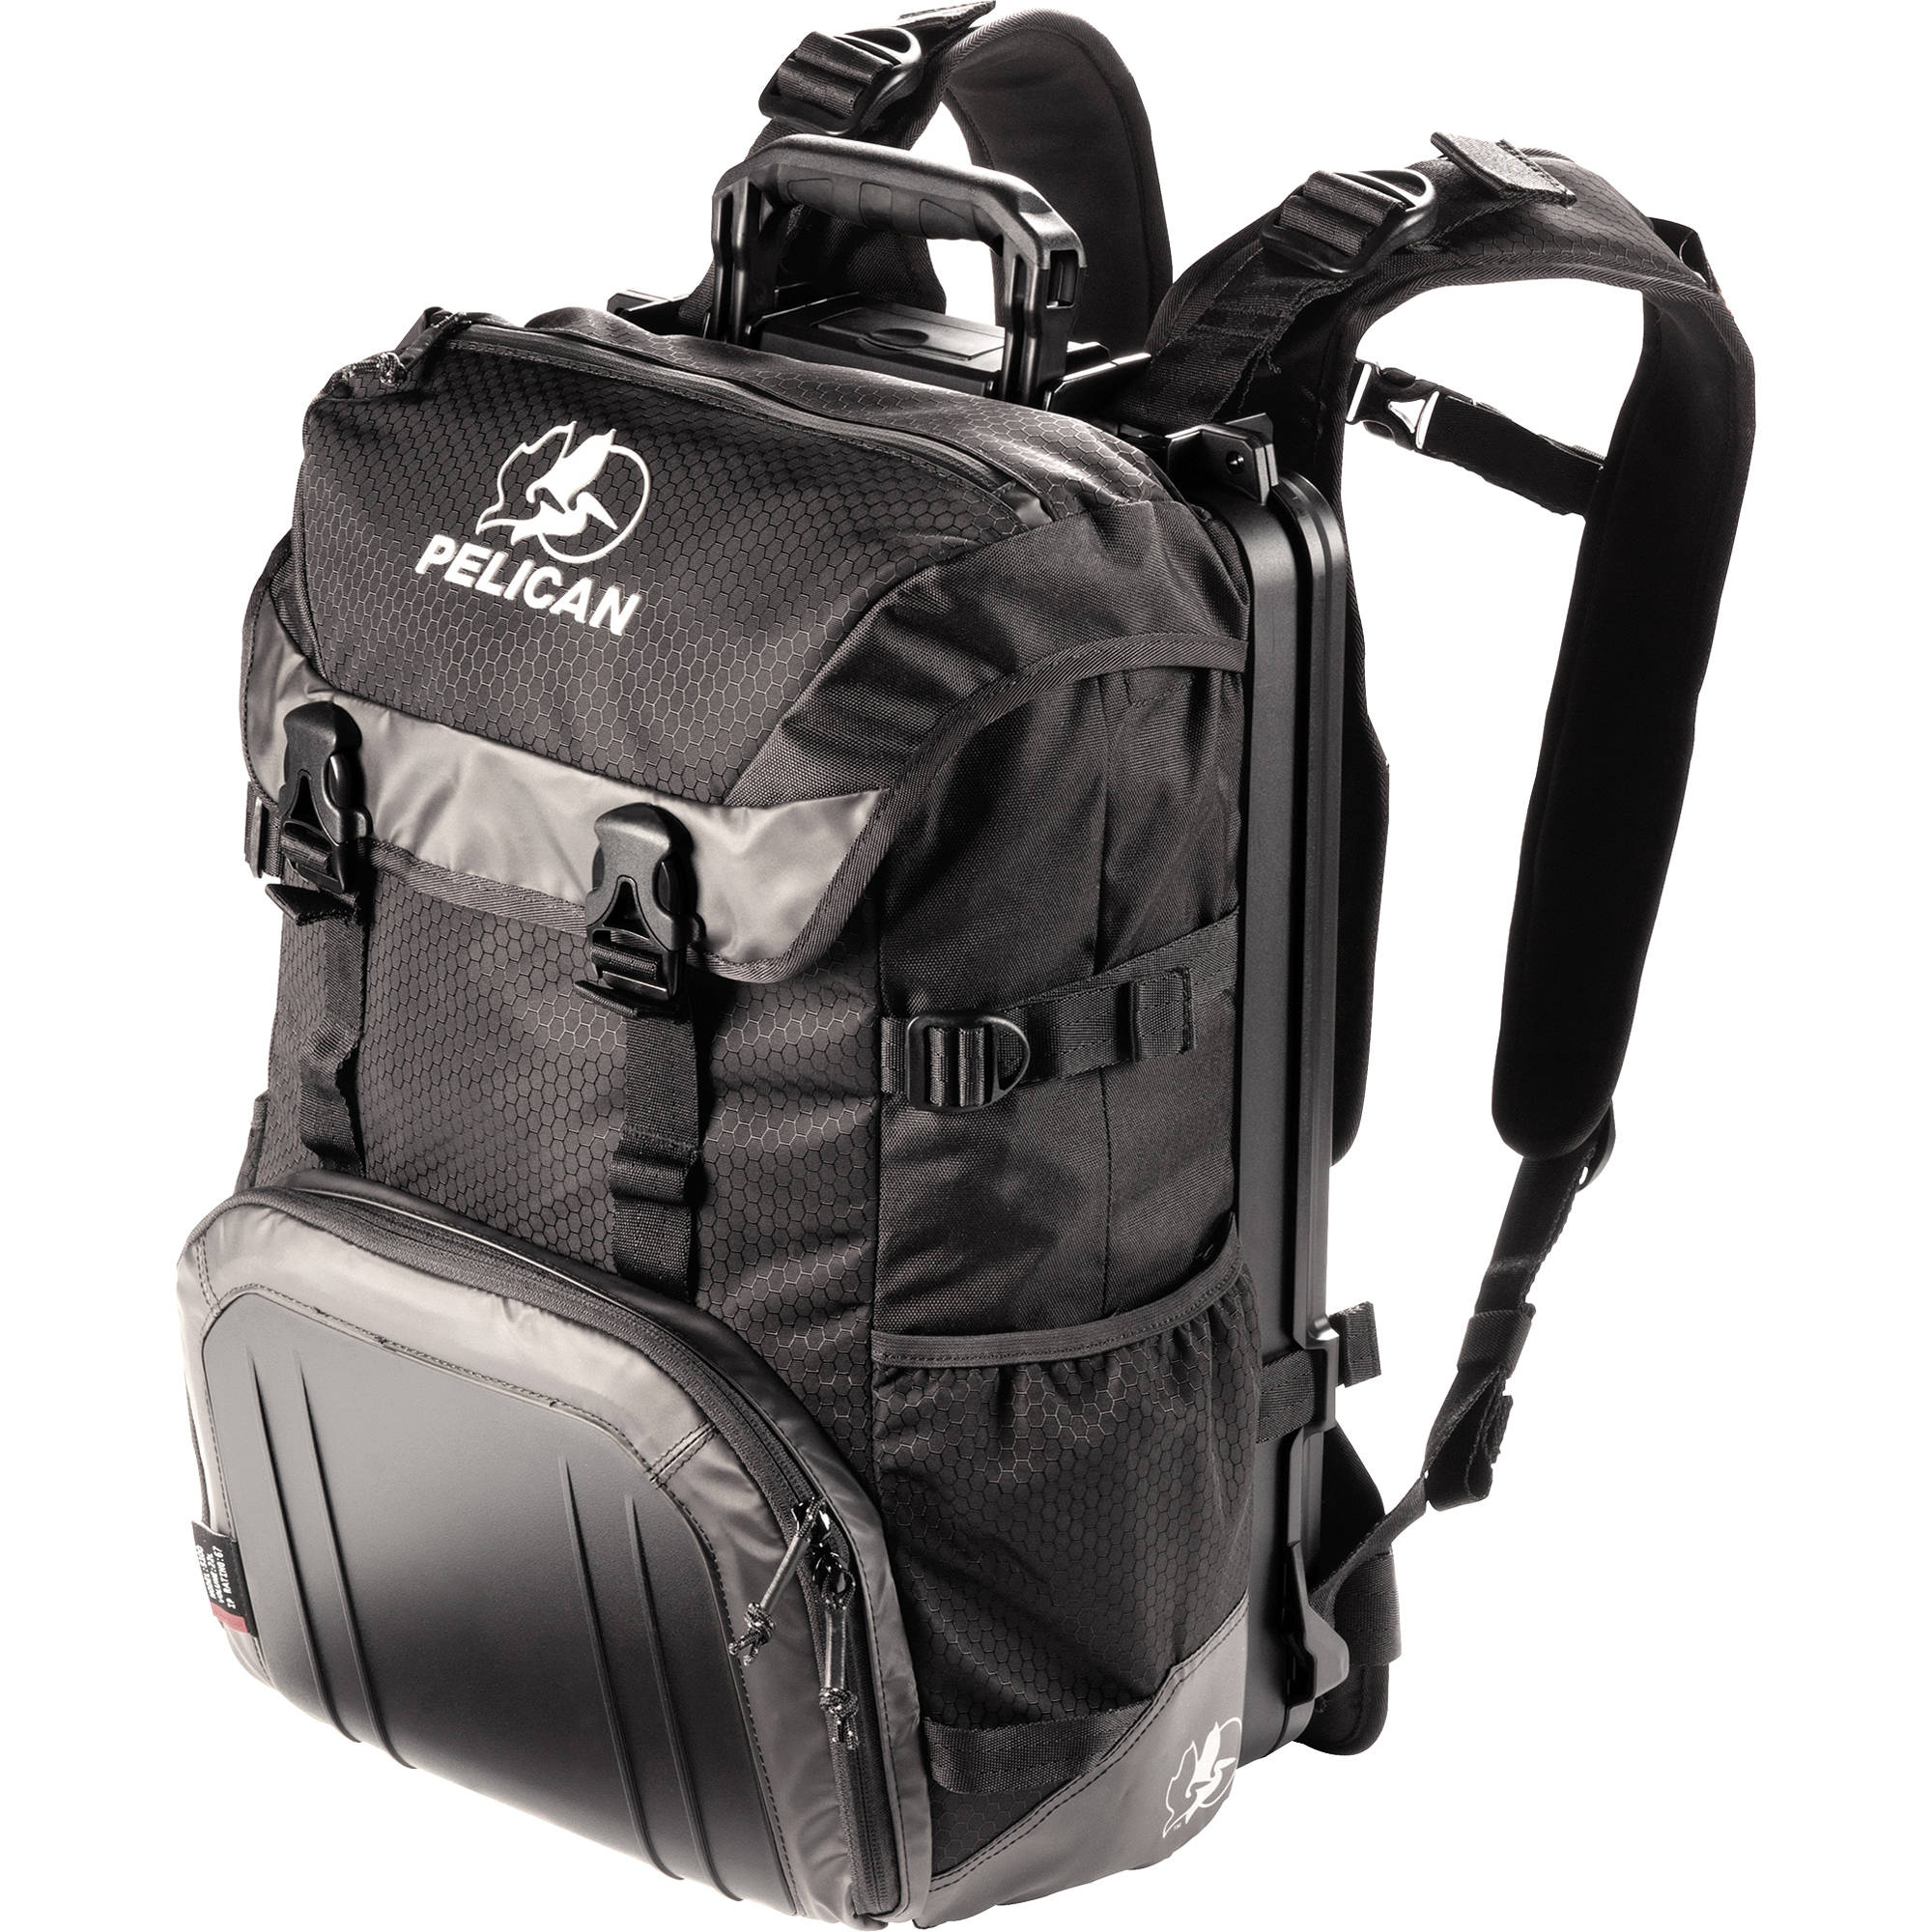 Pelican S100 Sport Elite Laptop Backpack (Black)